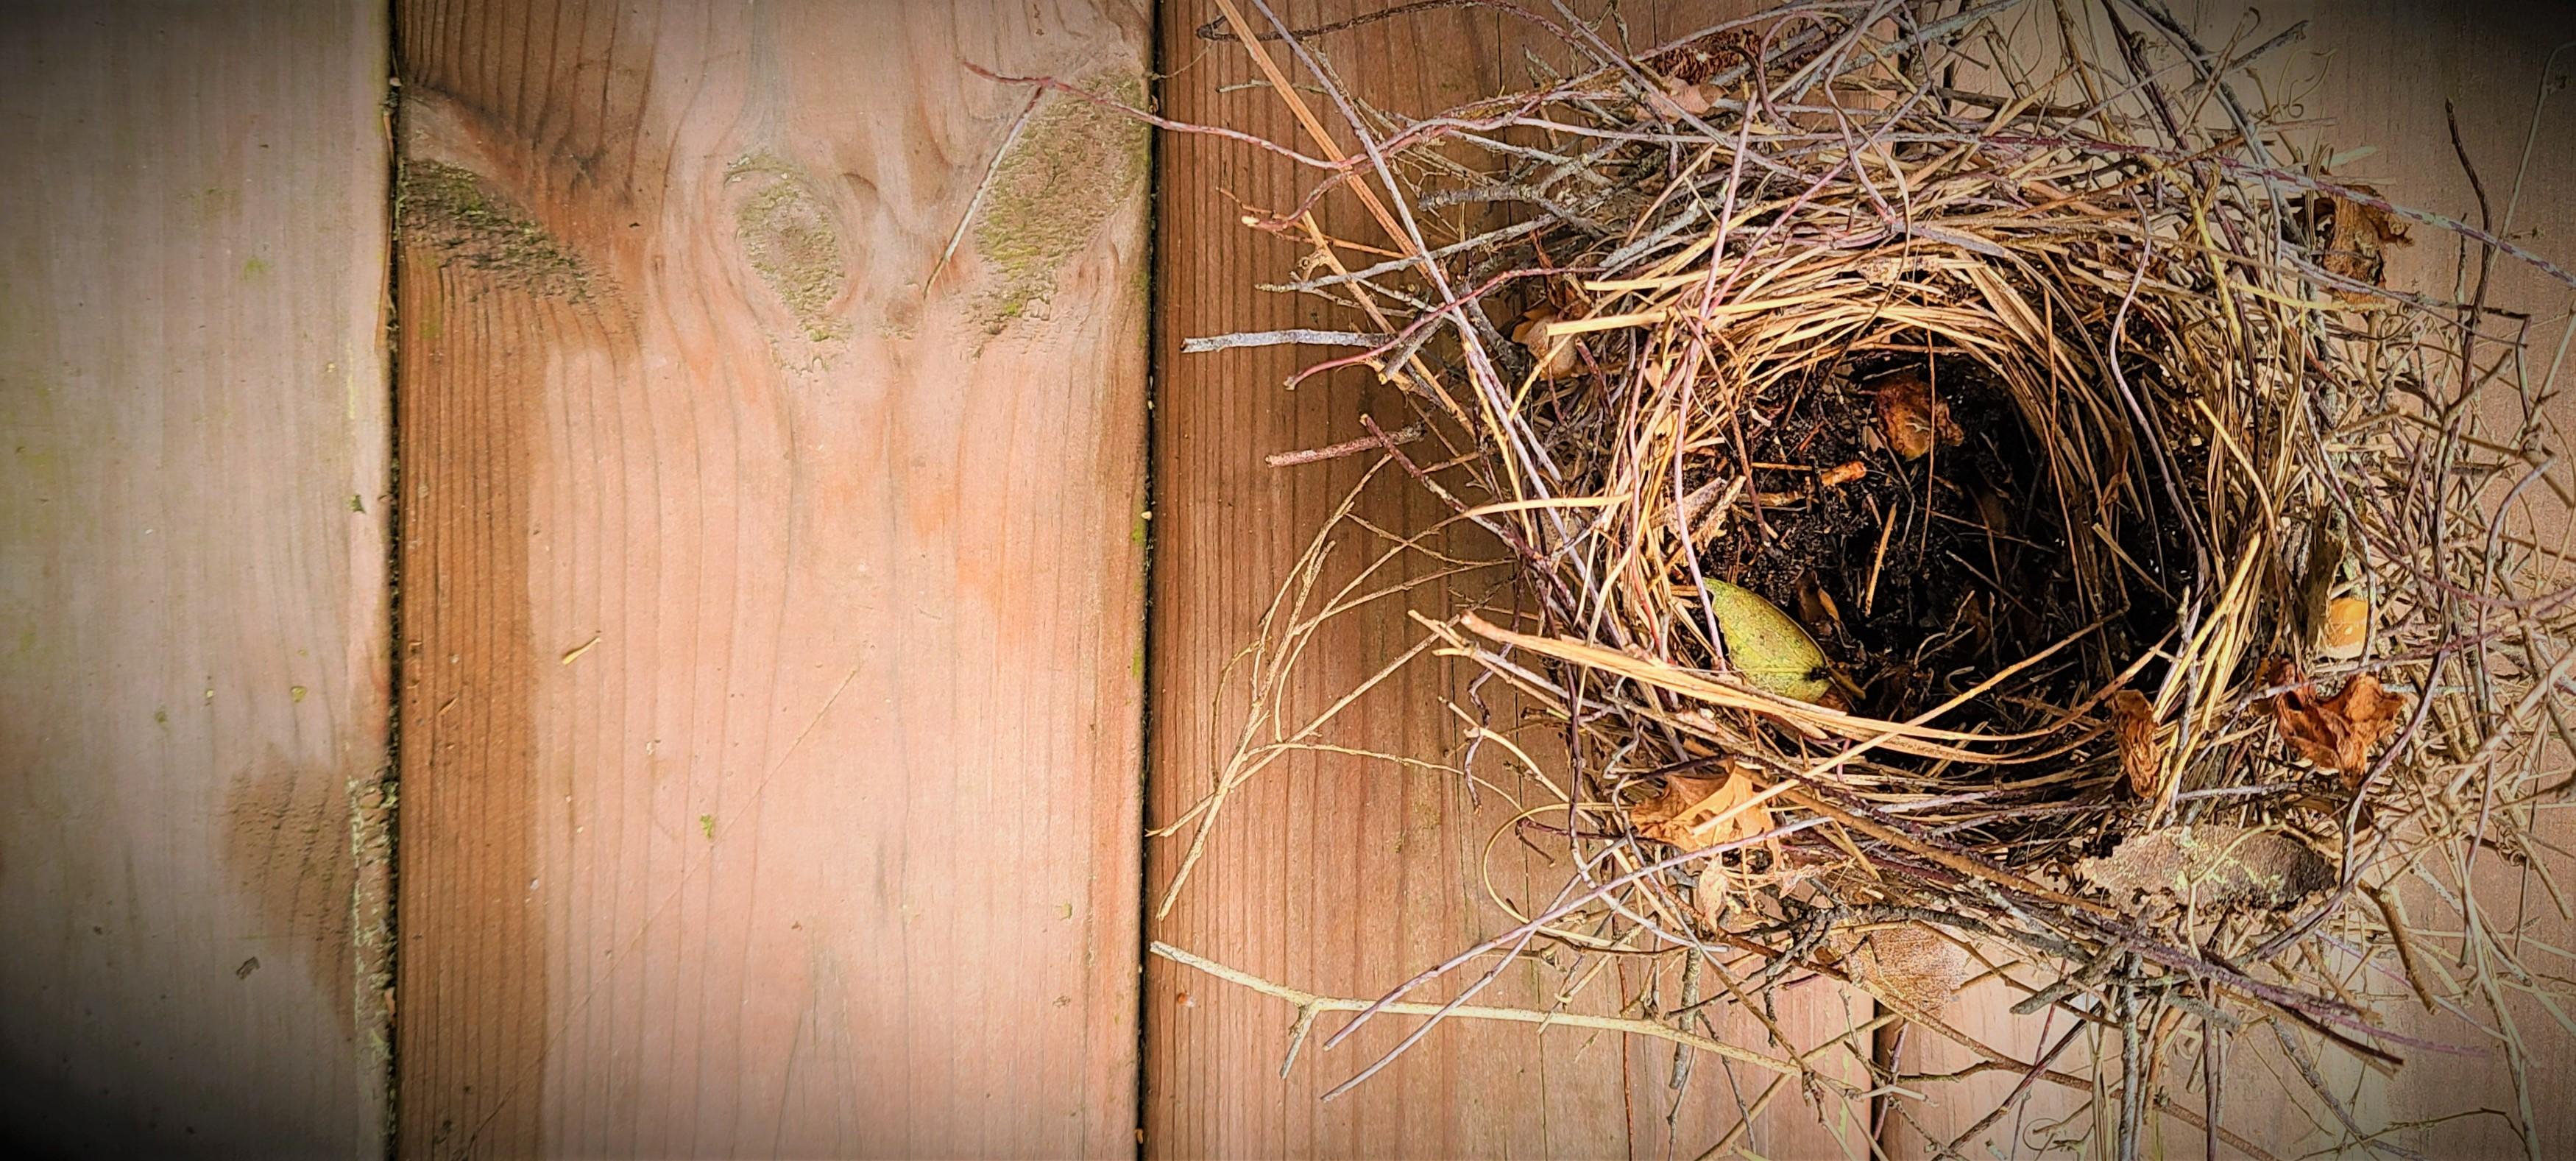 Empty Nest on Wood